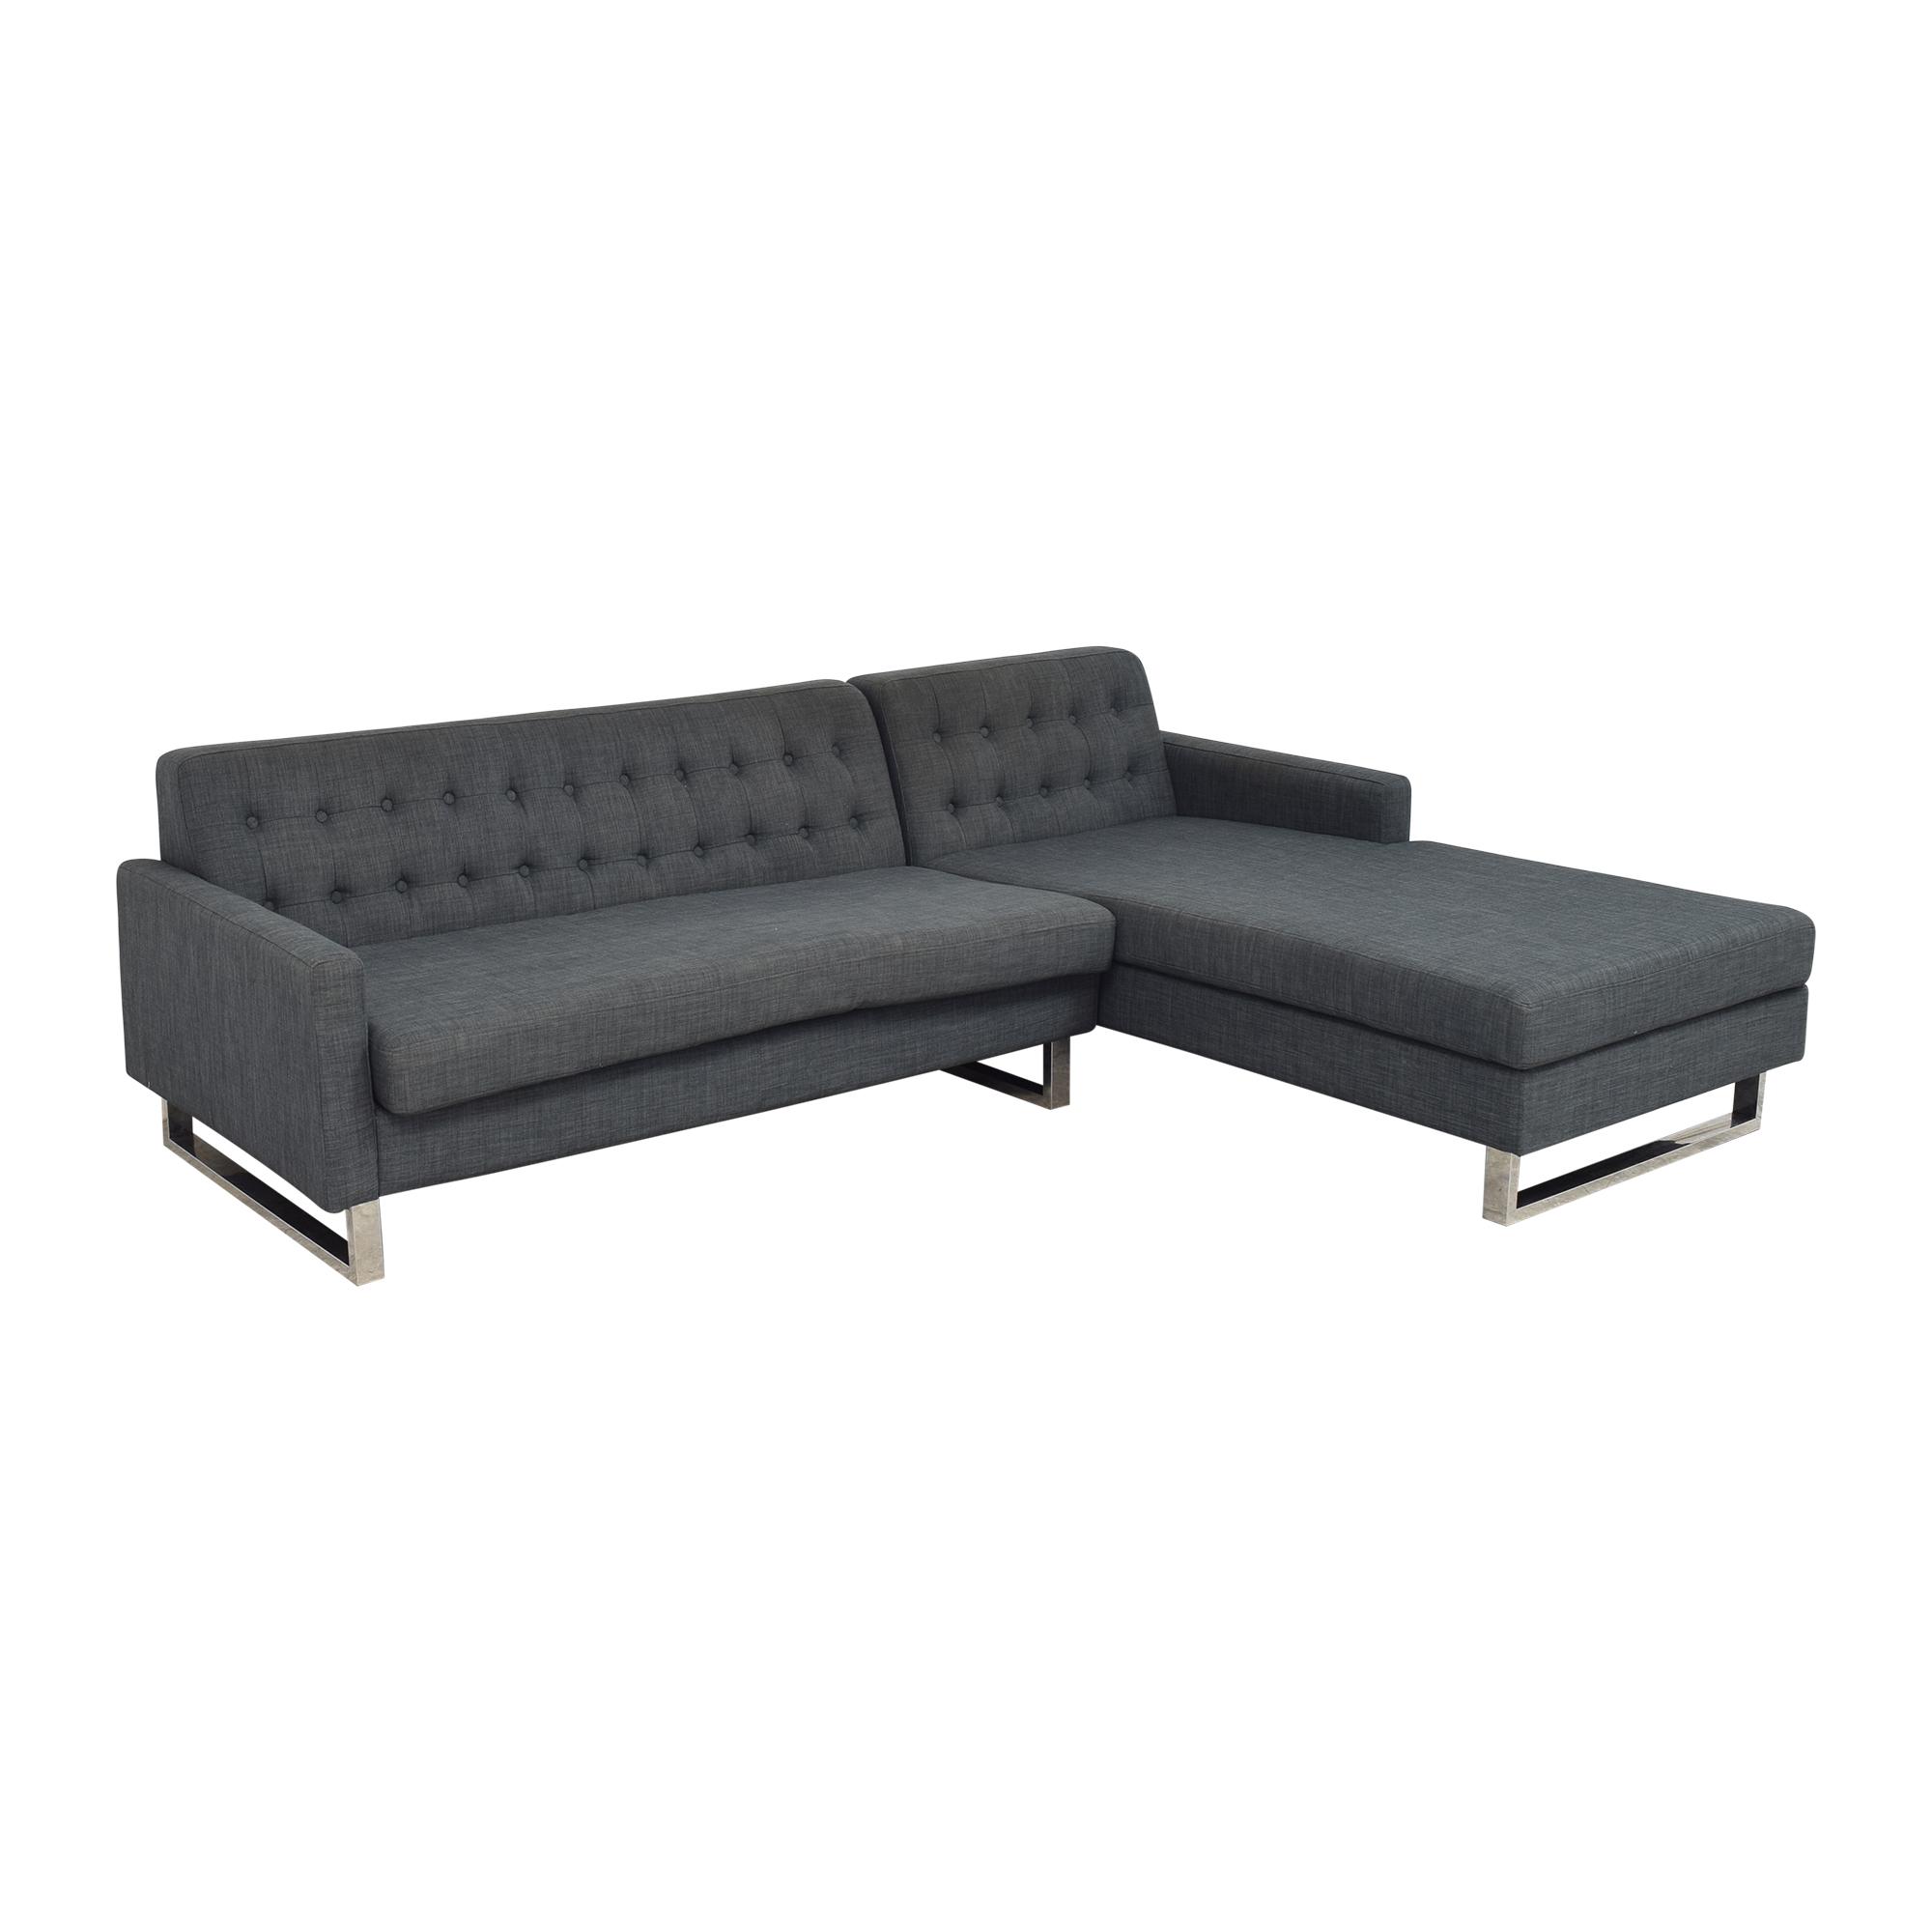 Pangea Home Nolan Right Arm Sectional Sofa sale